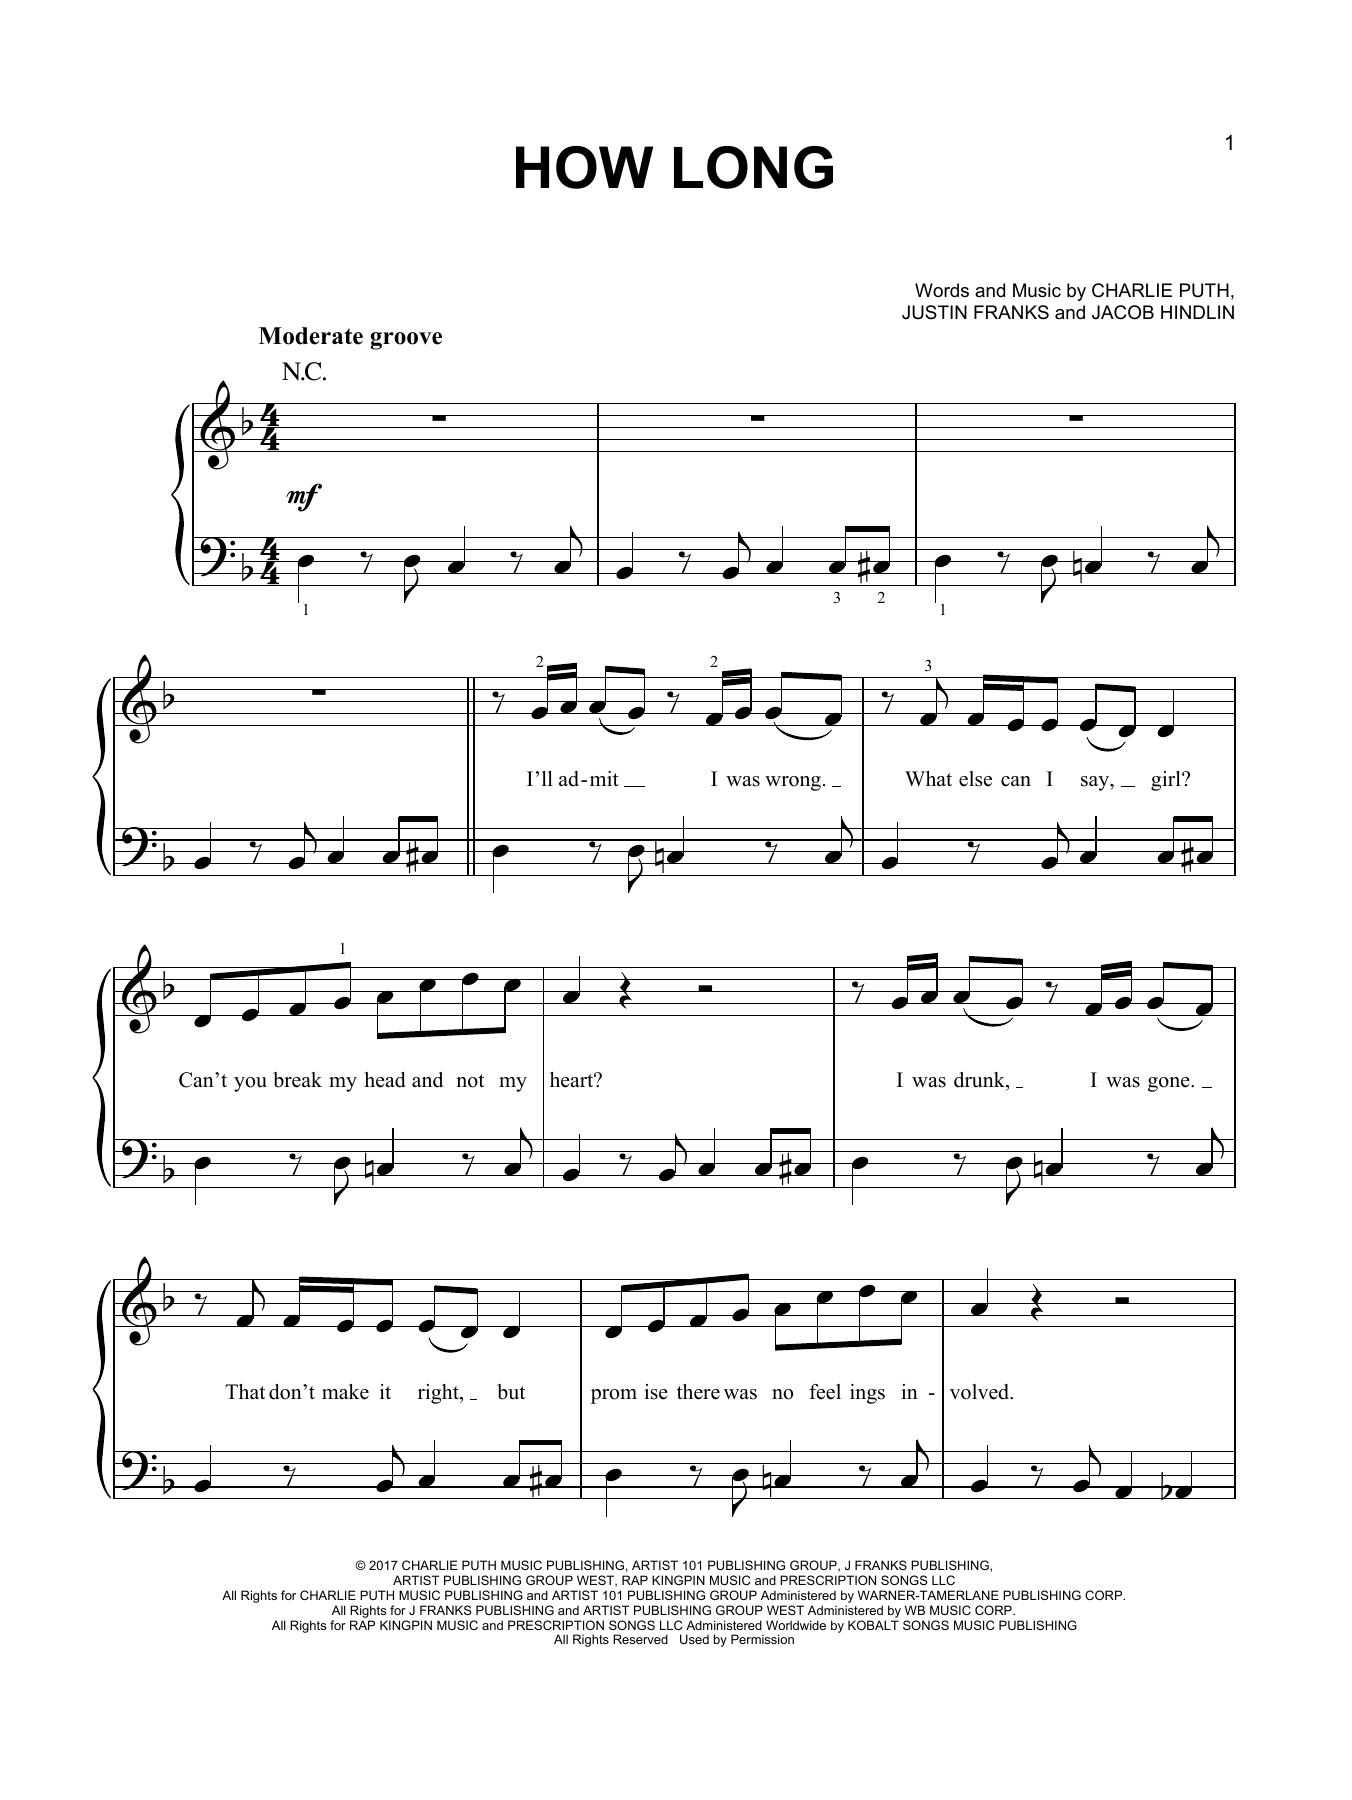 Charlie Puth Sheet Music Charlie Puth Sheet Music Notes [ 1800 x 1352 Pixel ]